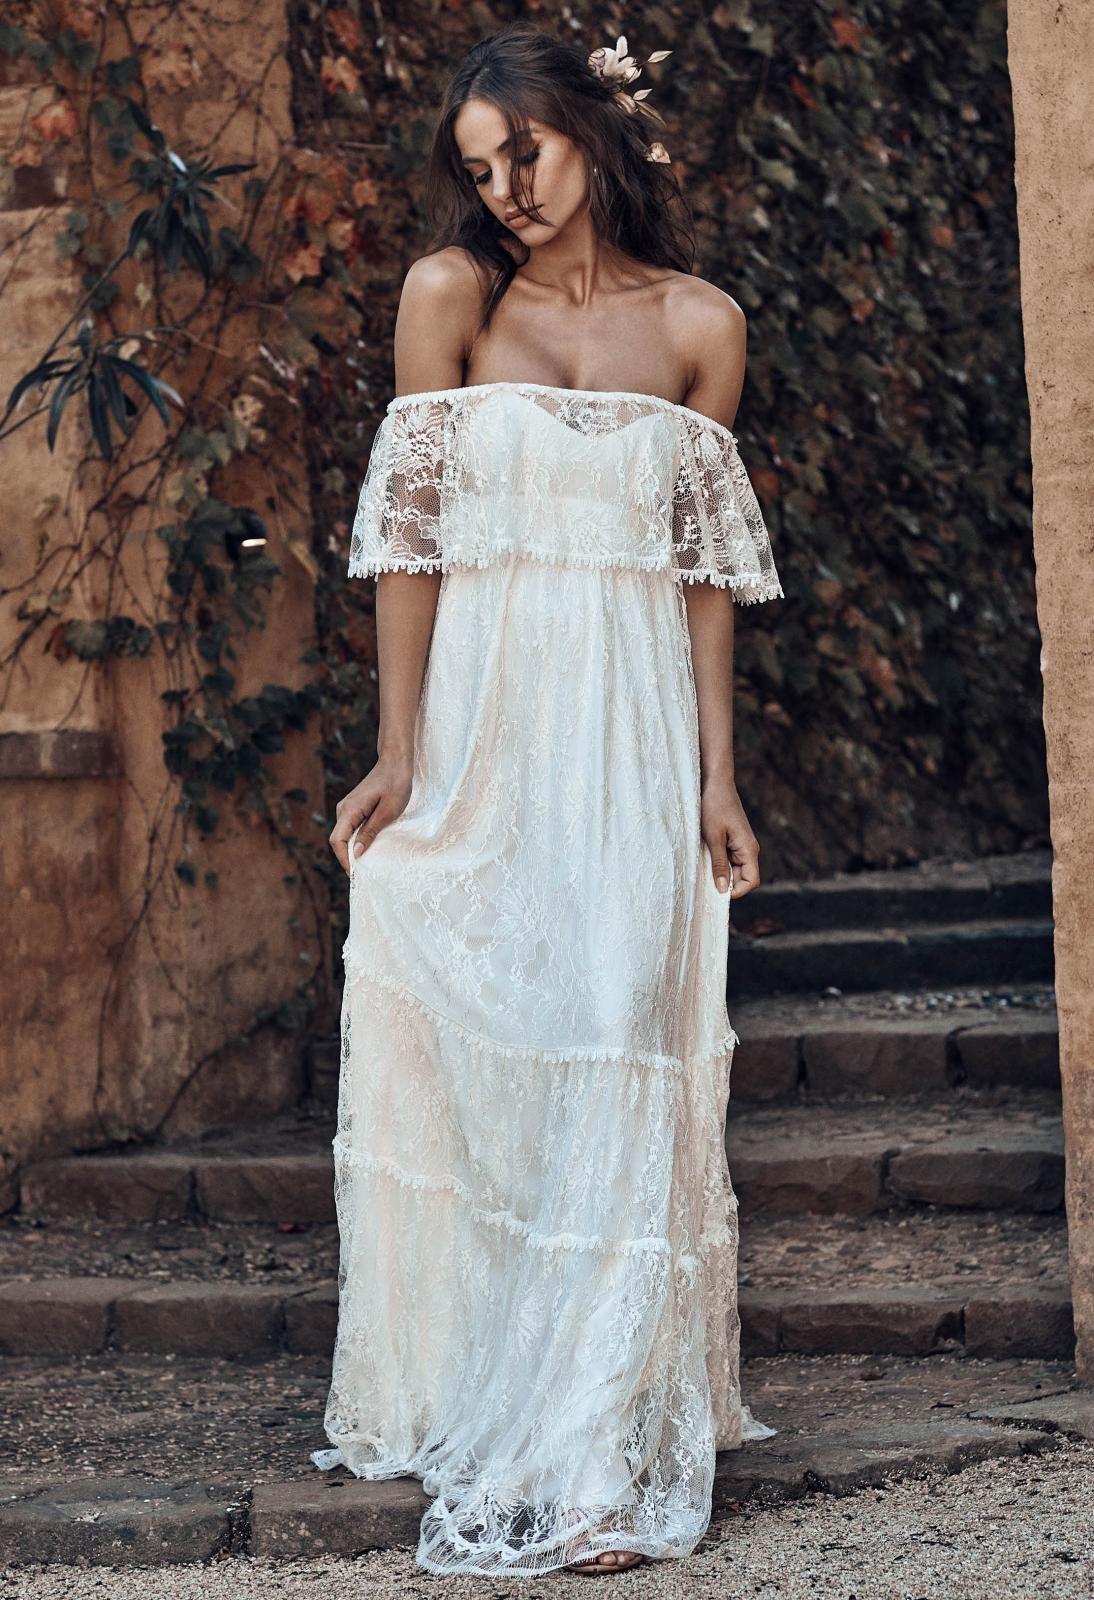 Franca bohemian bride pinterest wedding bridal dresses and